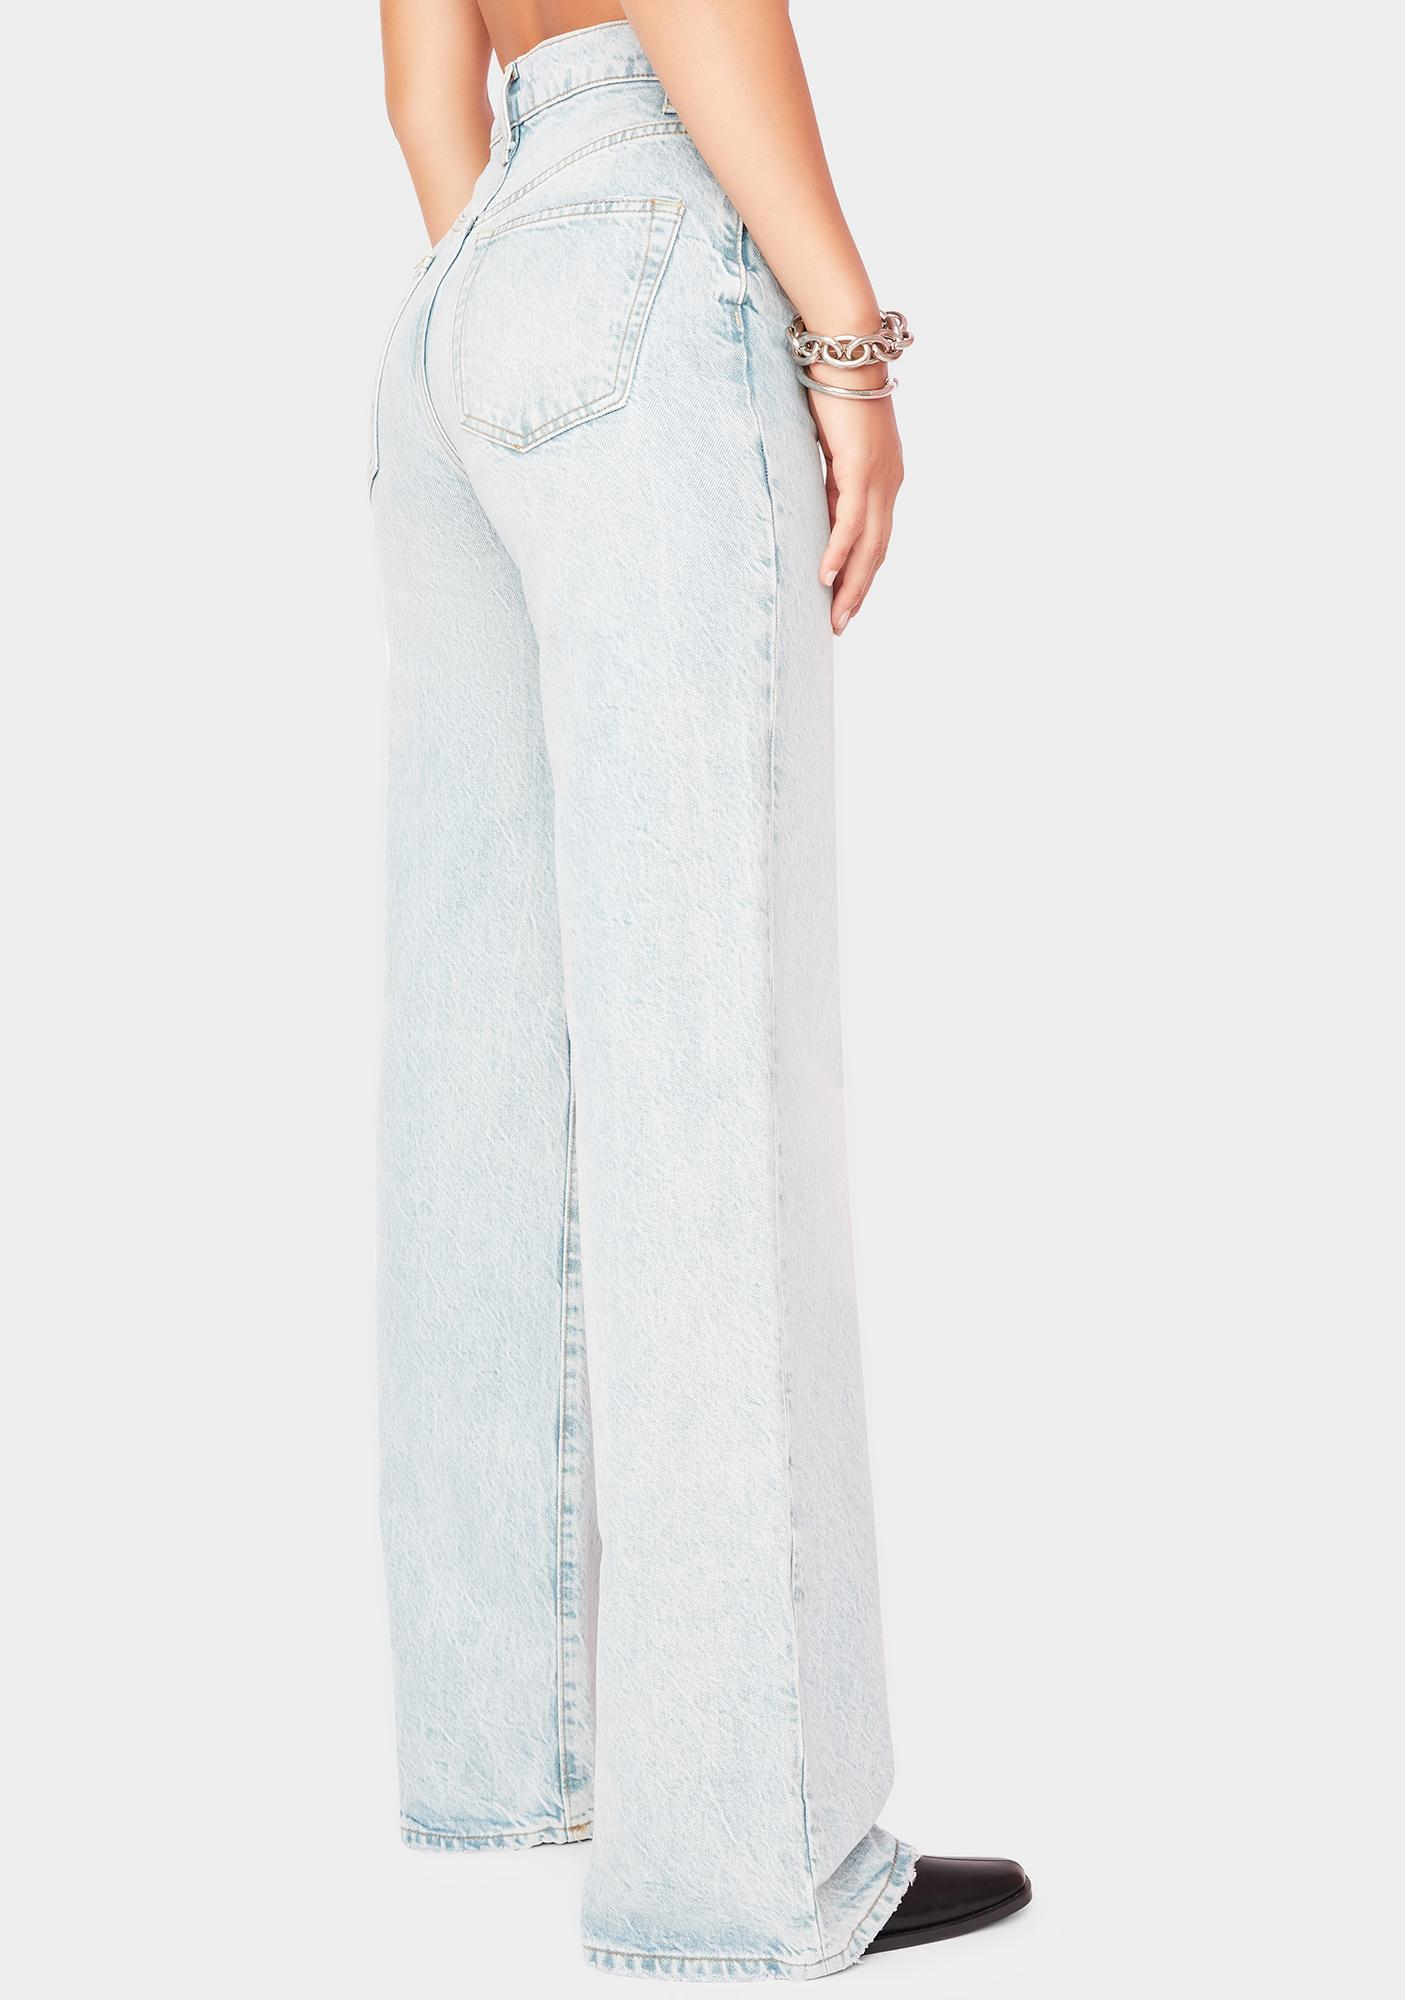 Free People Astoria Wide Leg Jeans